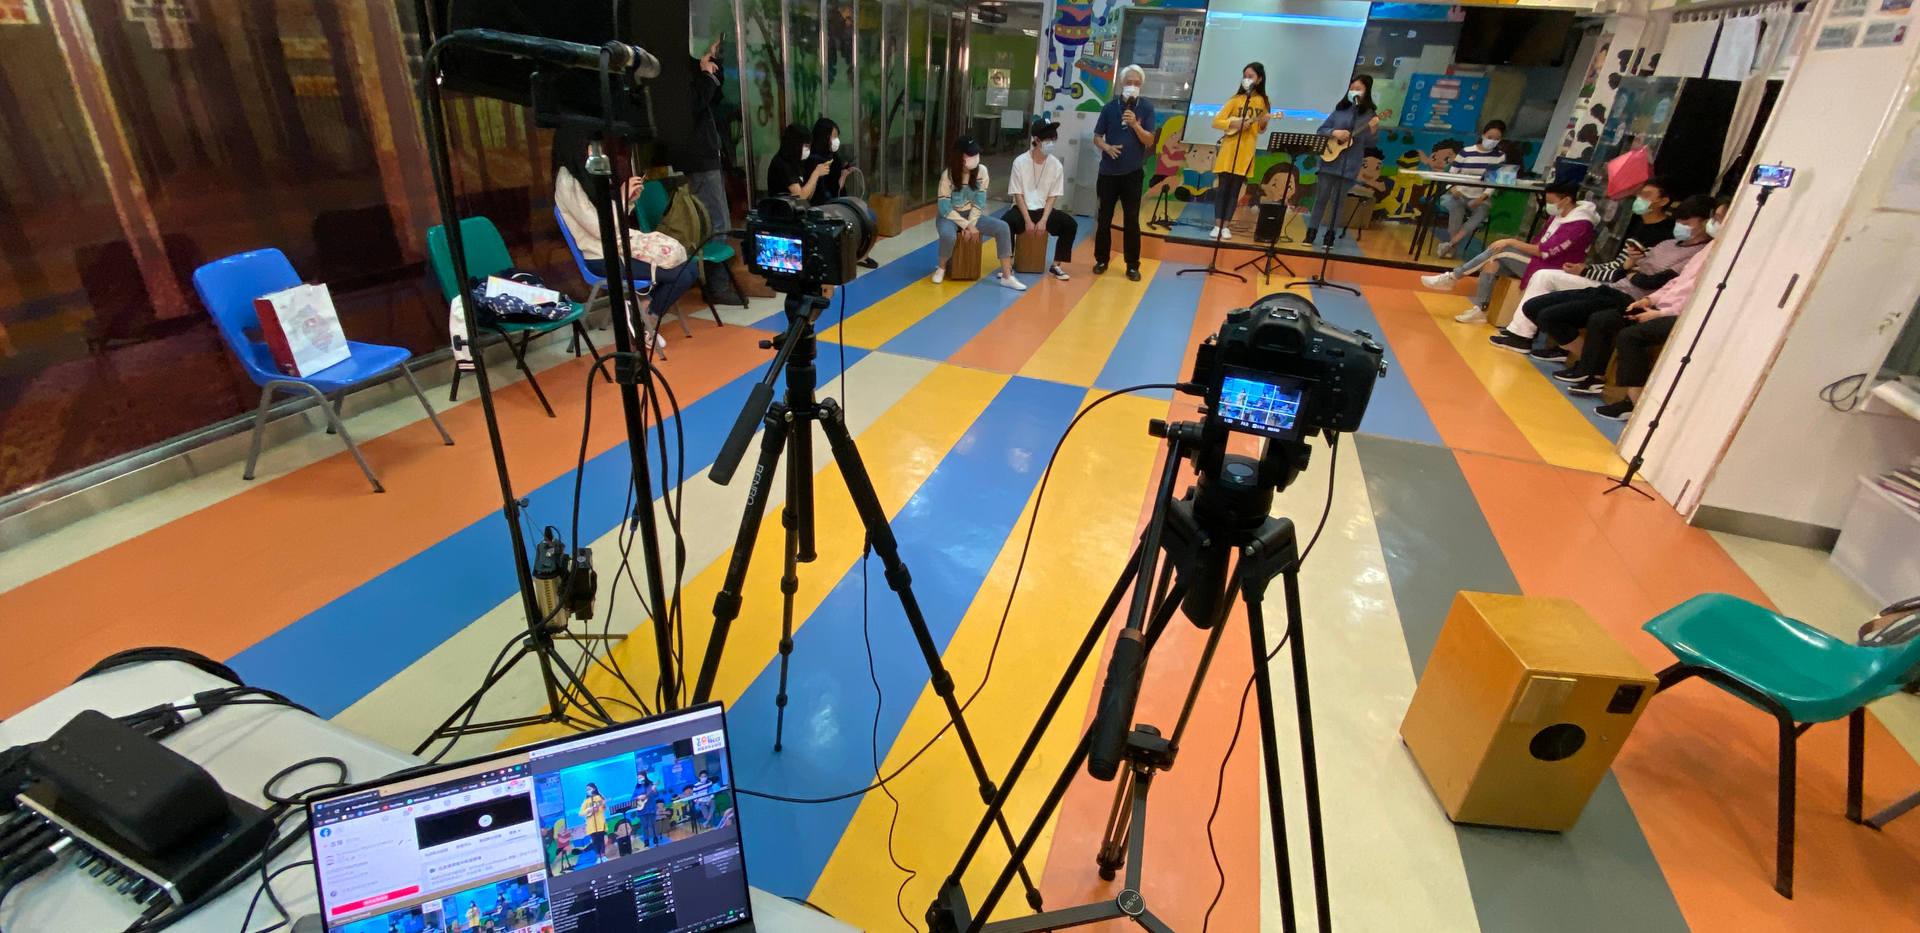 Medium scale live streaming